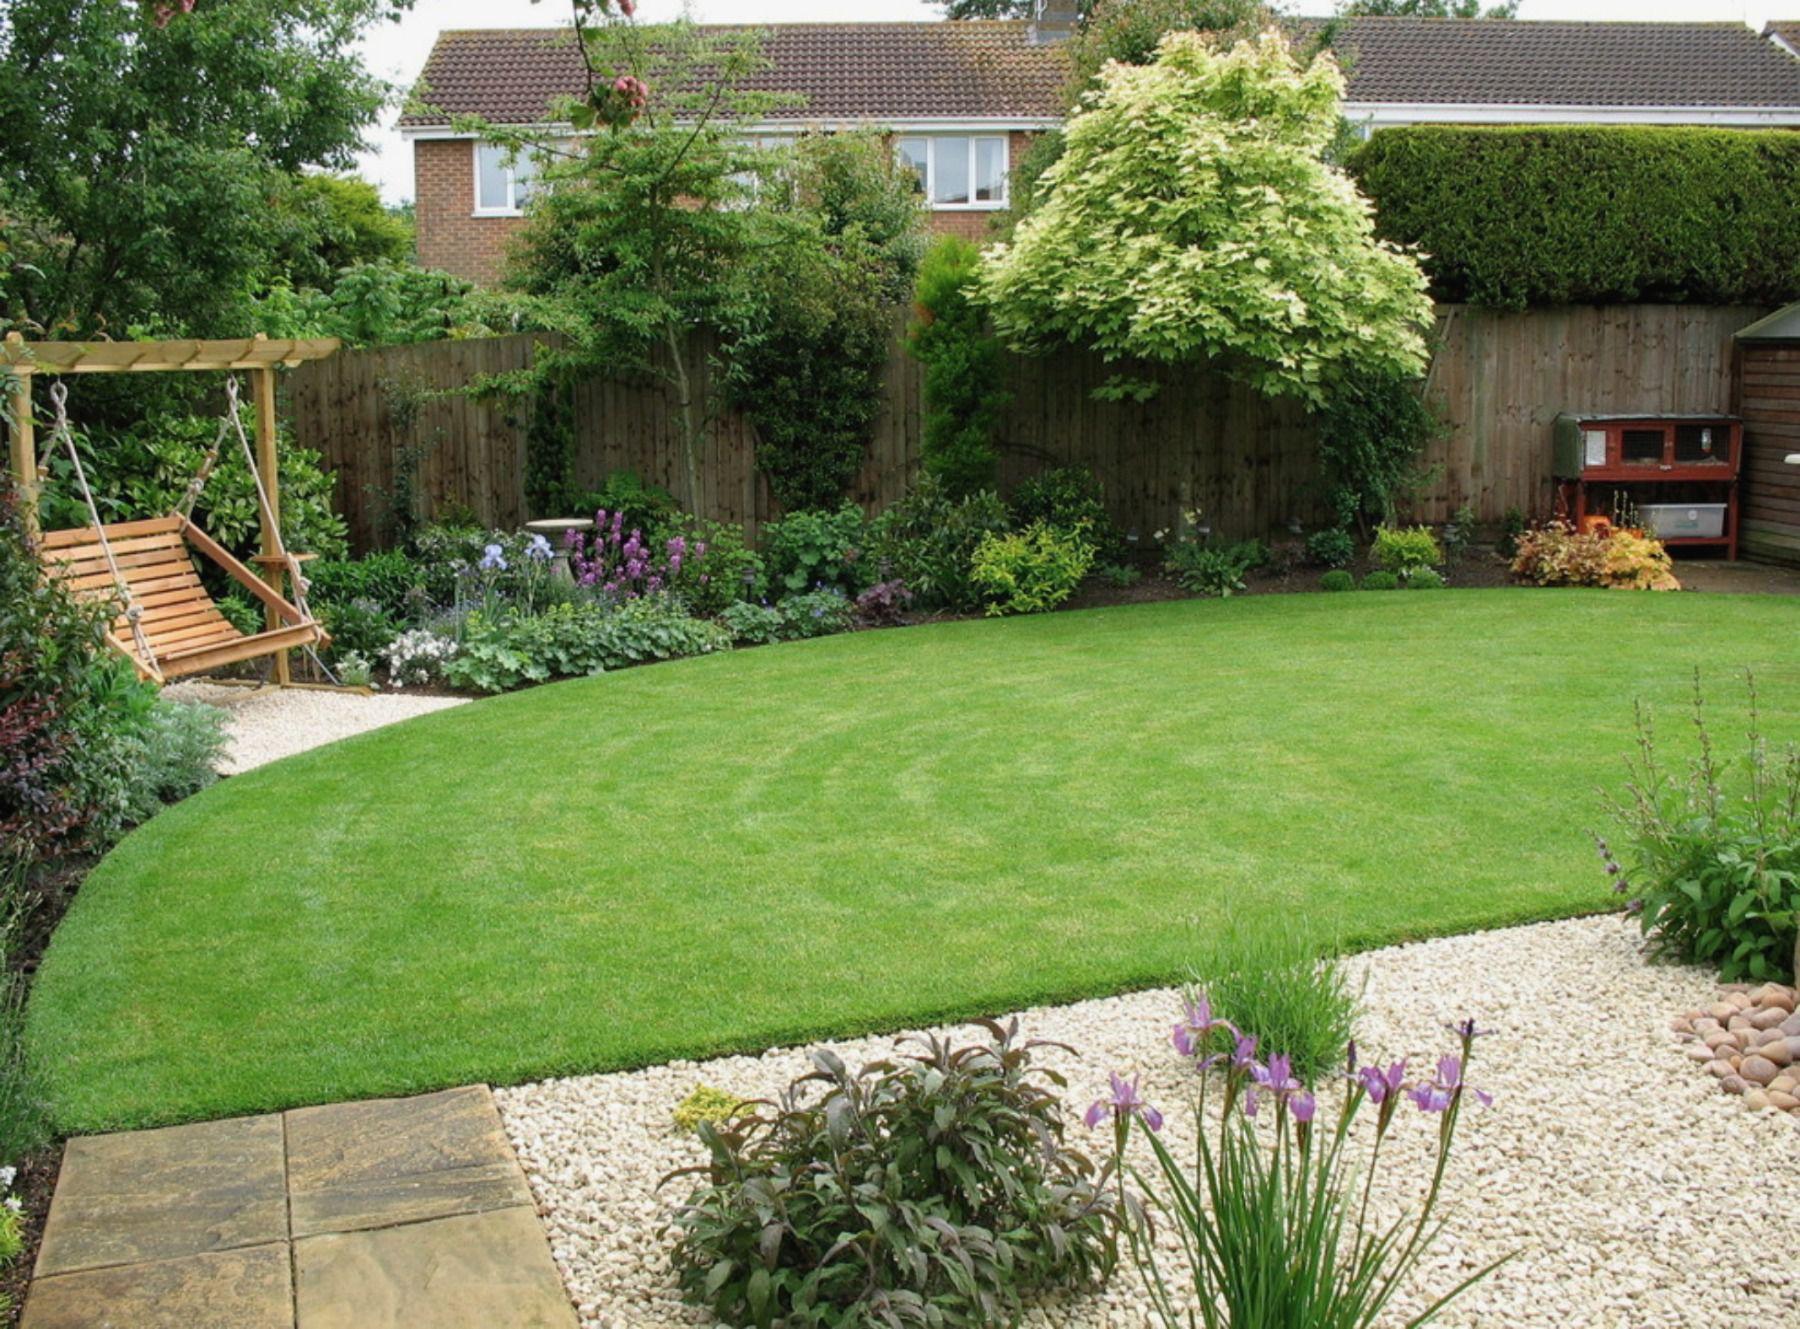 20.SIMPHOME.COM backyard landscaping ideas